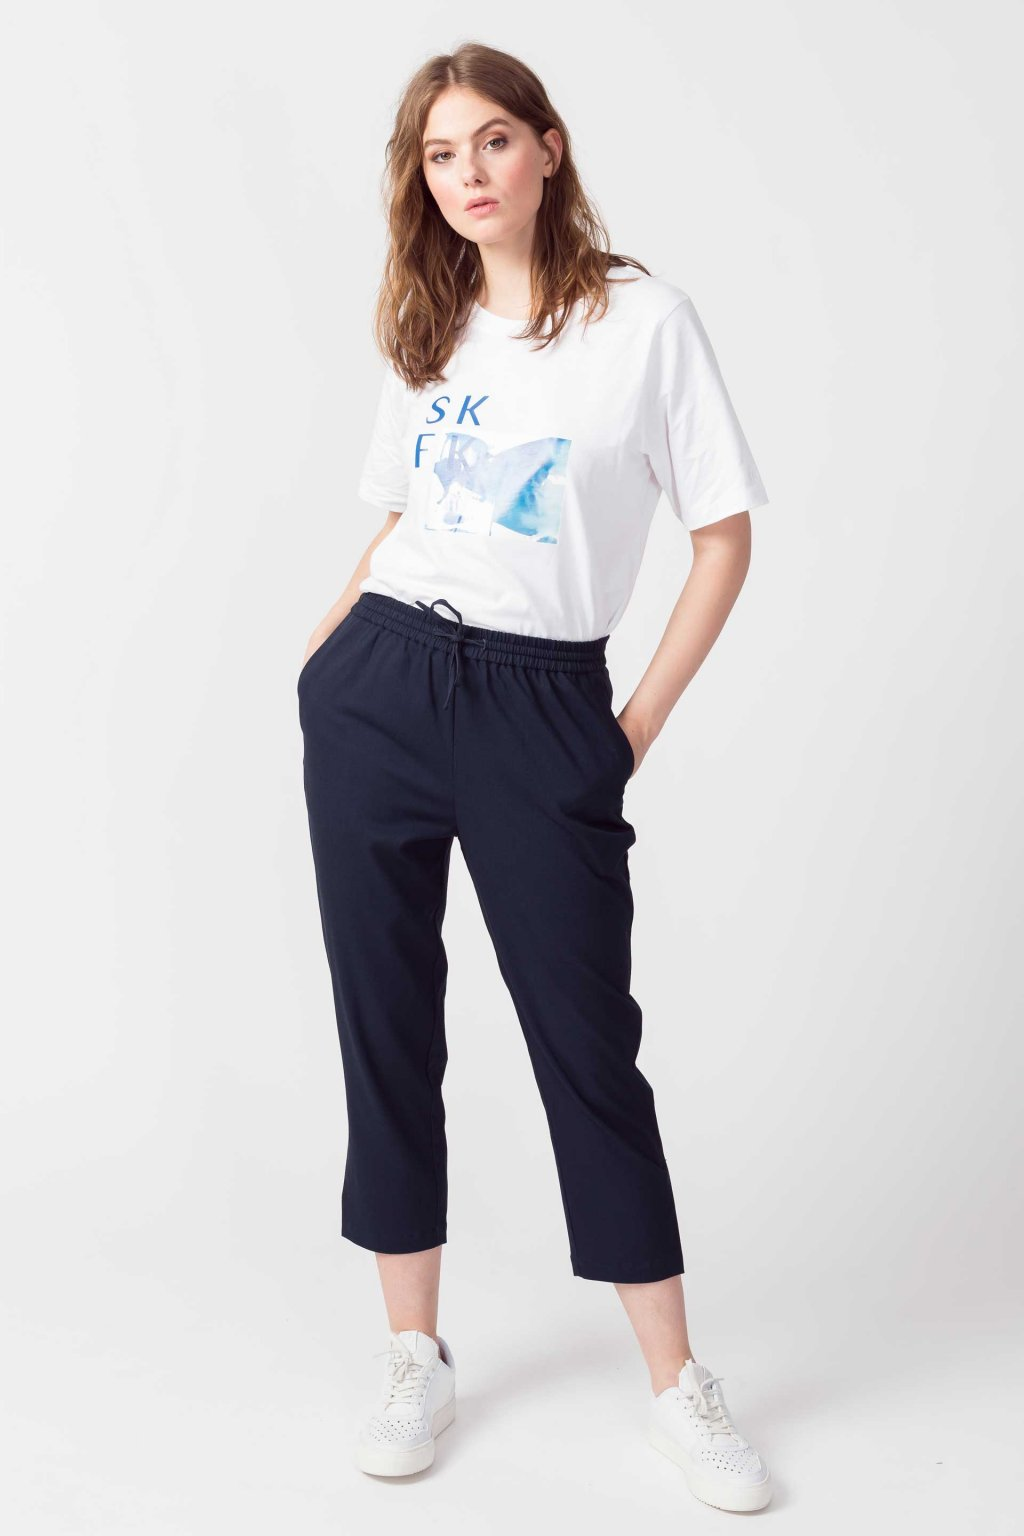 trouser organic cotton kima skfk wtr00275 b9 ofb